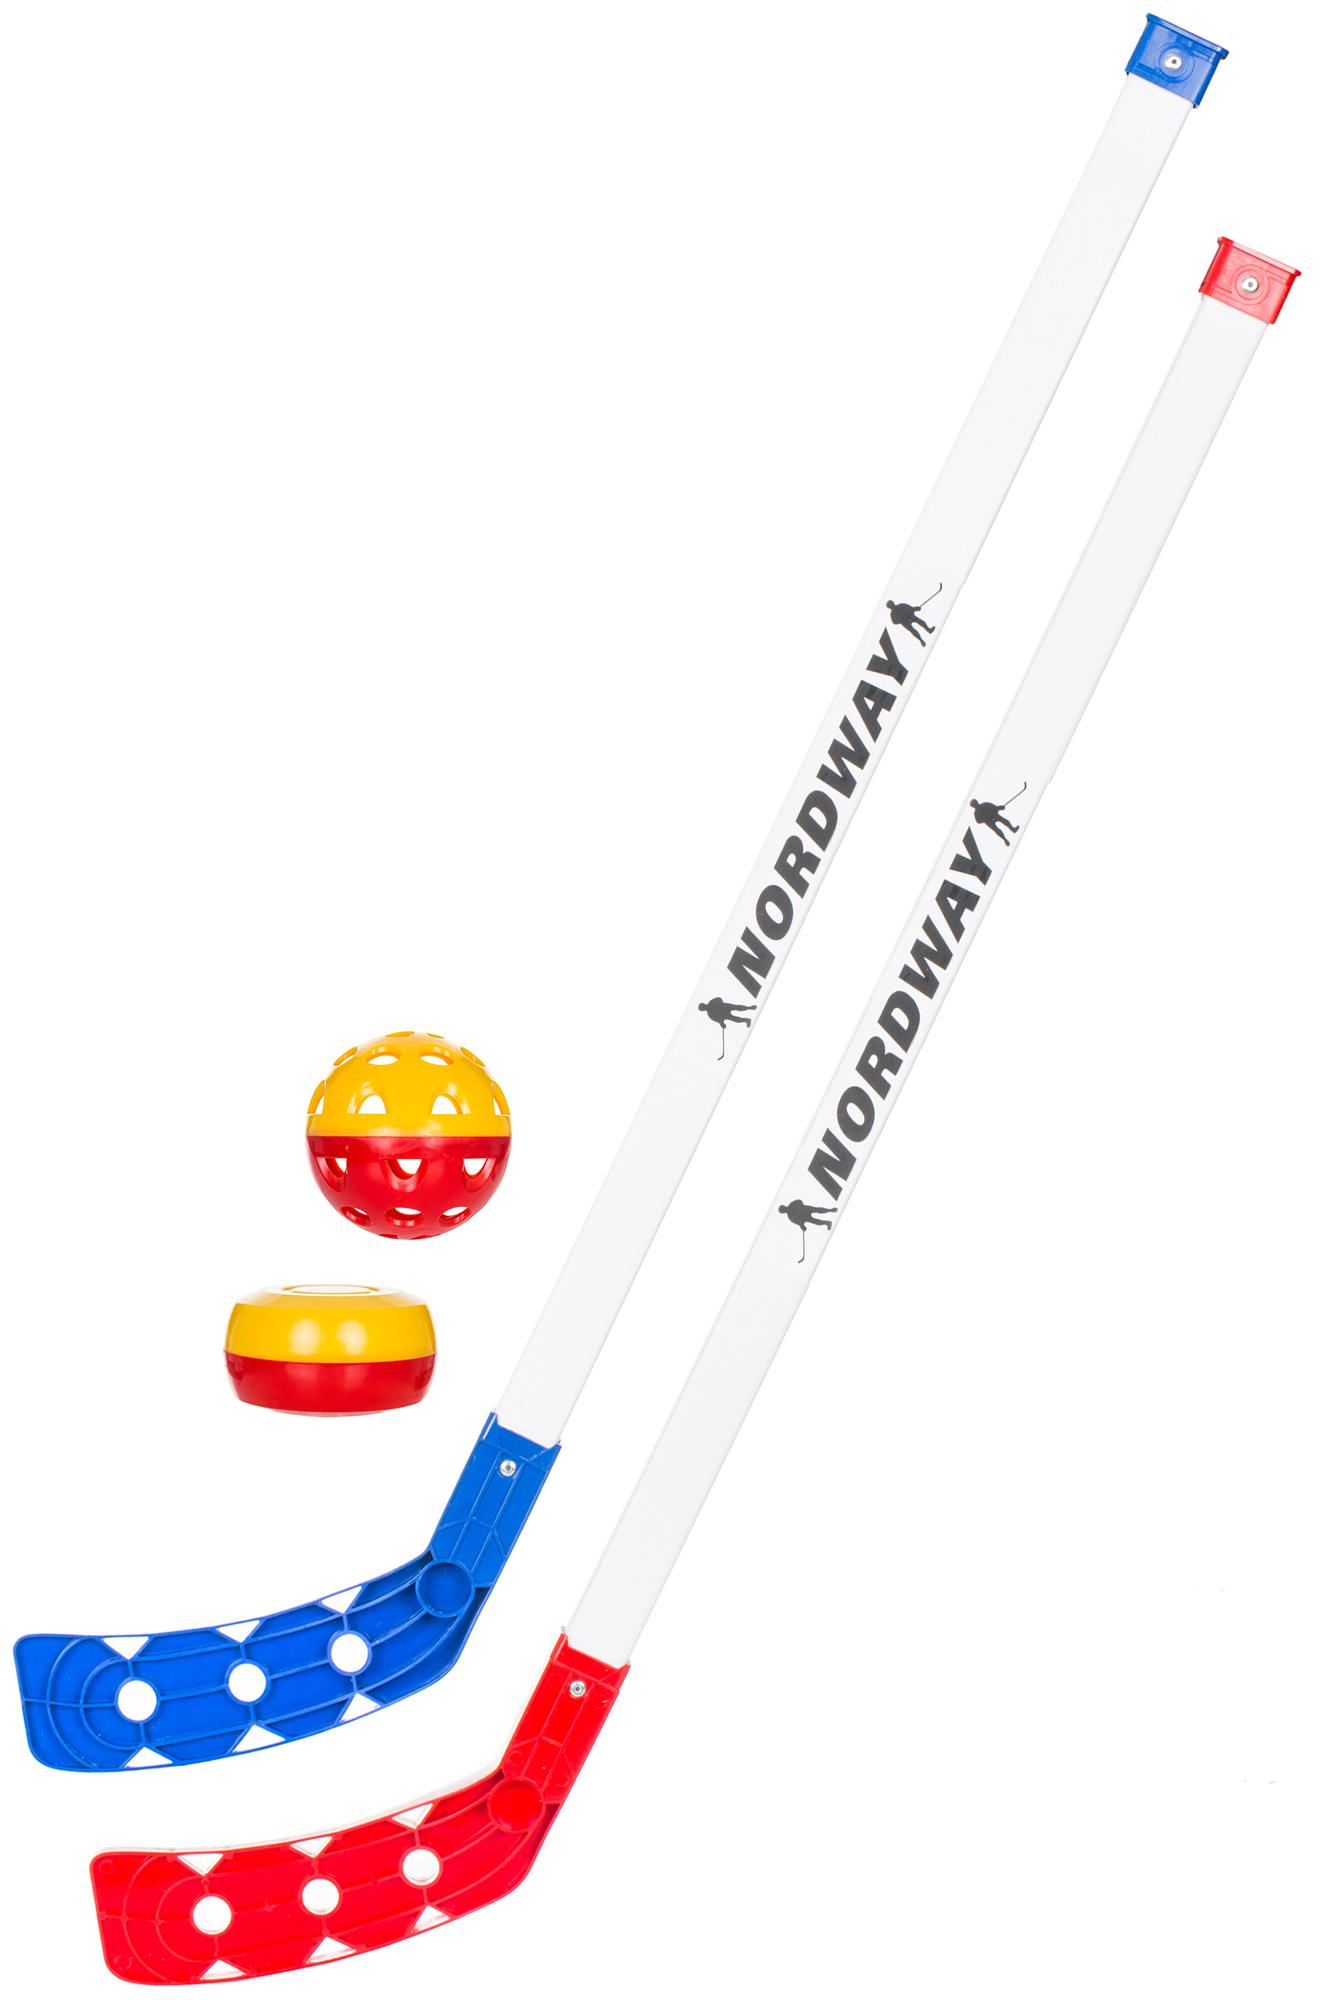 Nordway Ice hockey stick (детские)